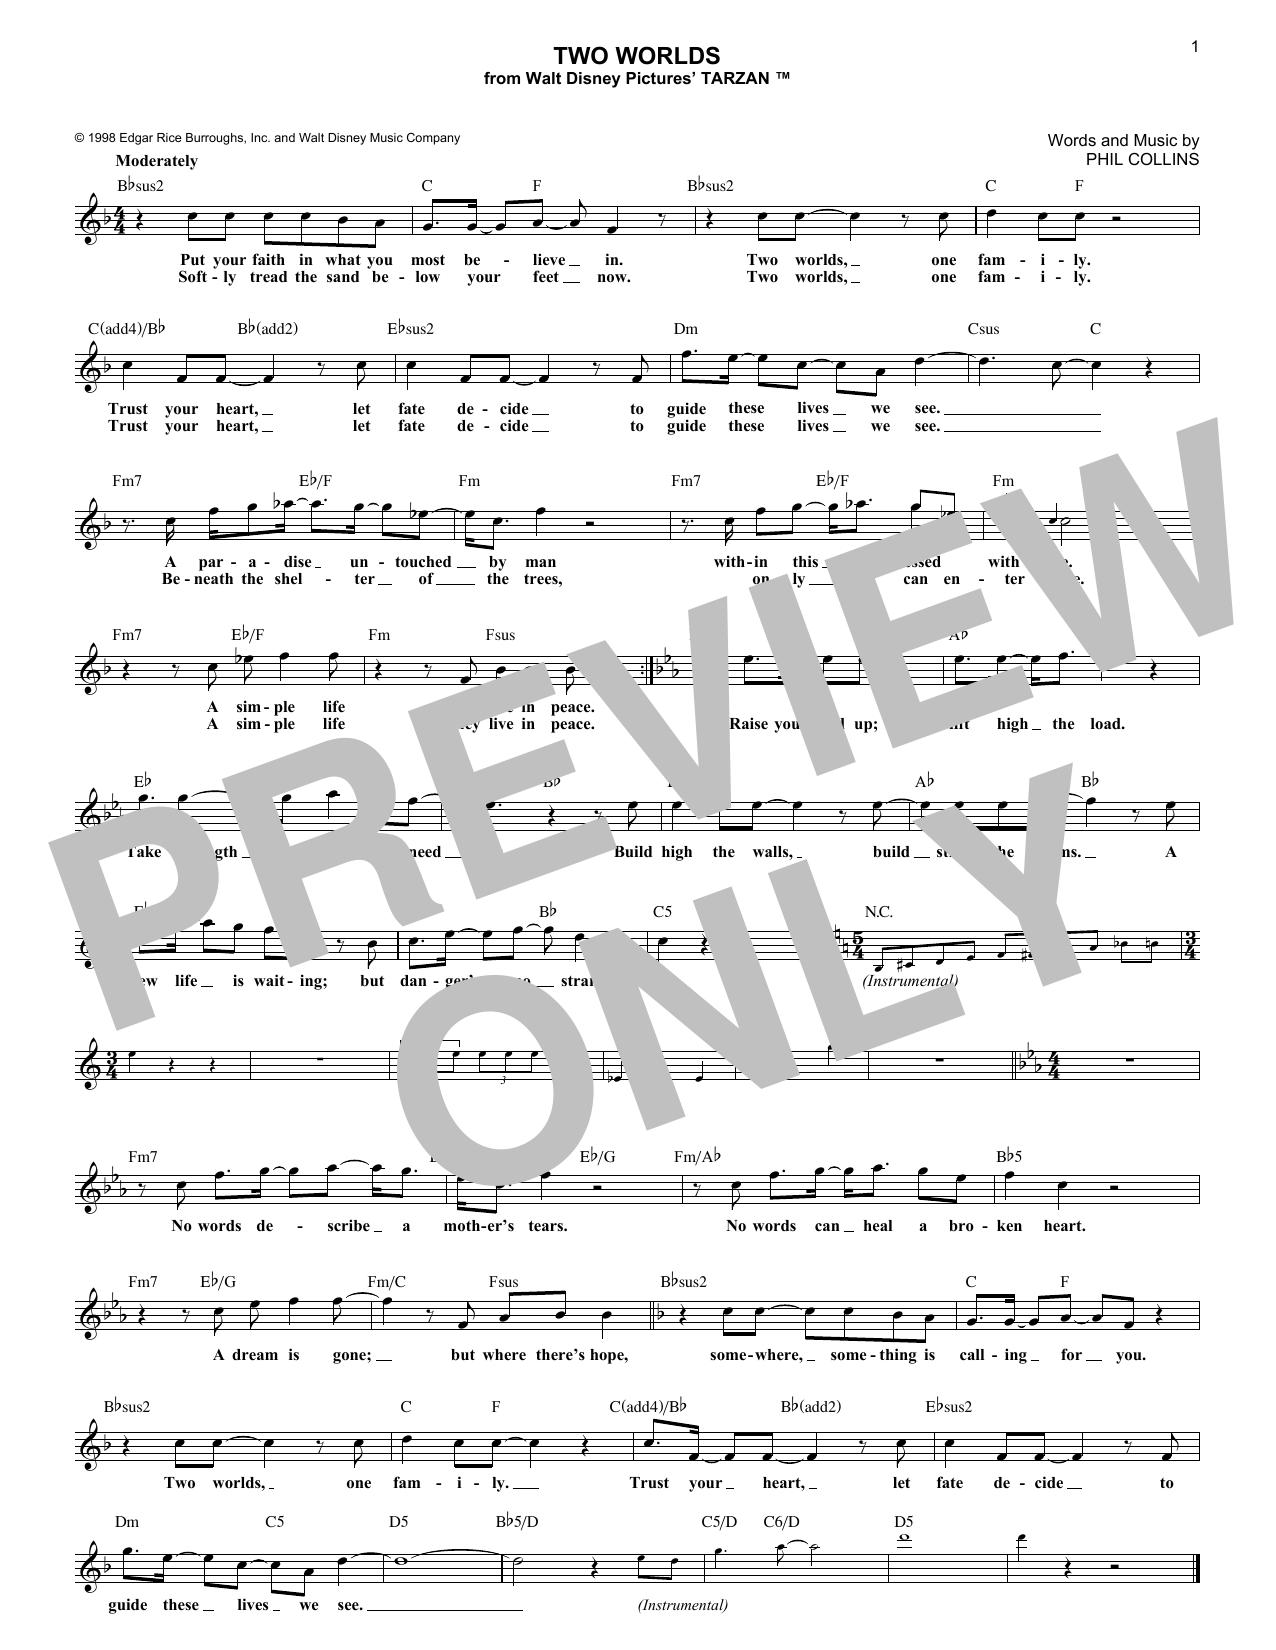 Two Worlds (Melody Line, Lyrics & Chords)